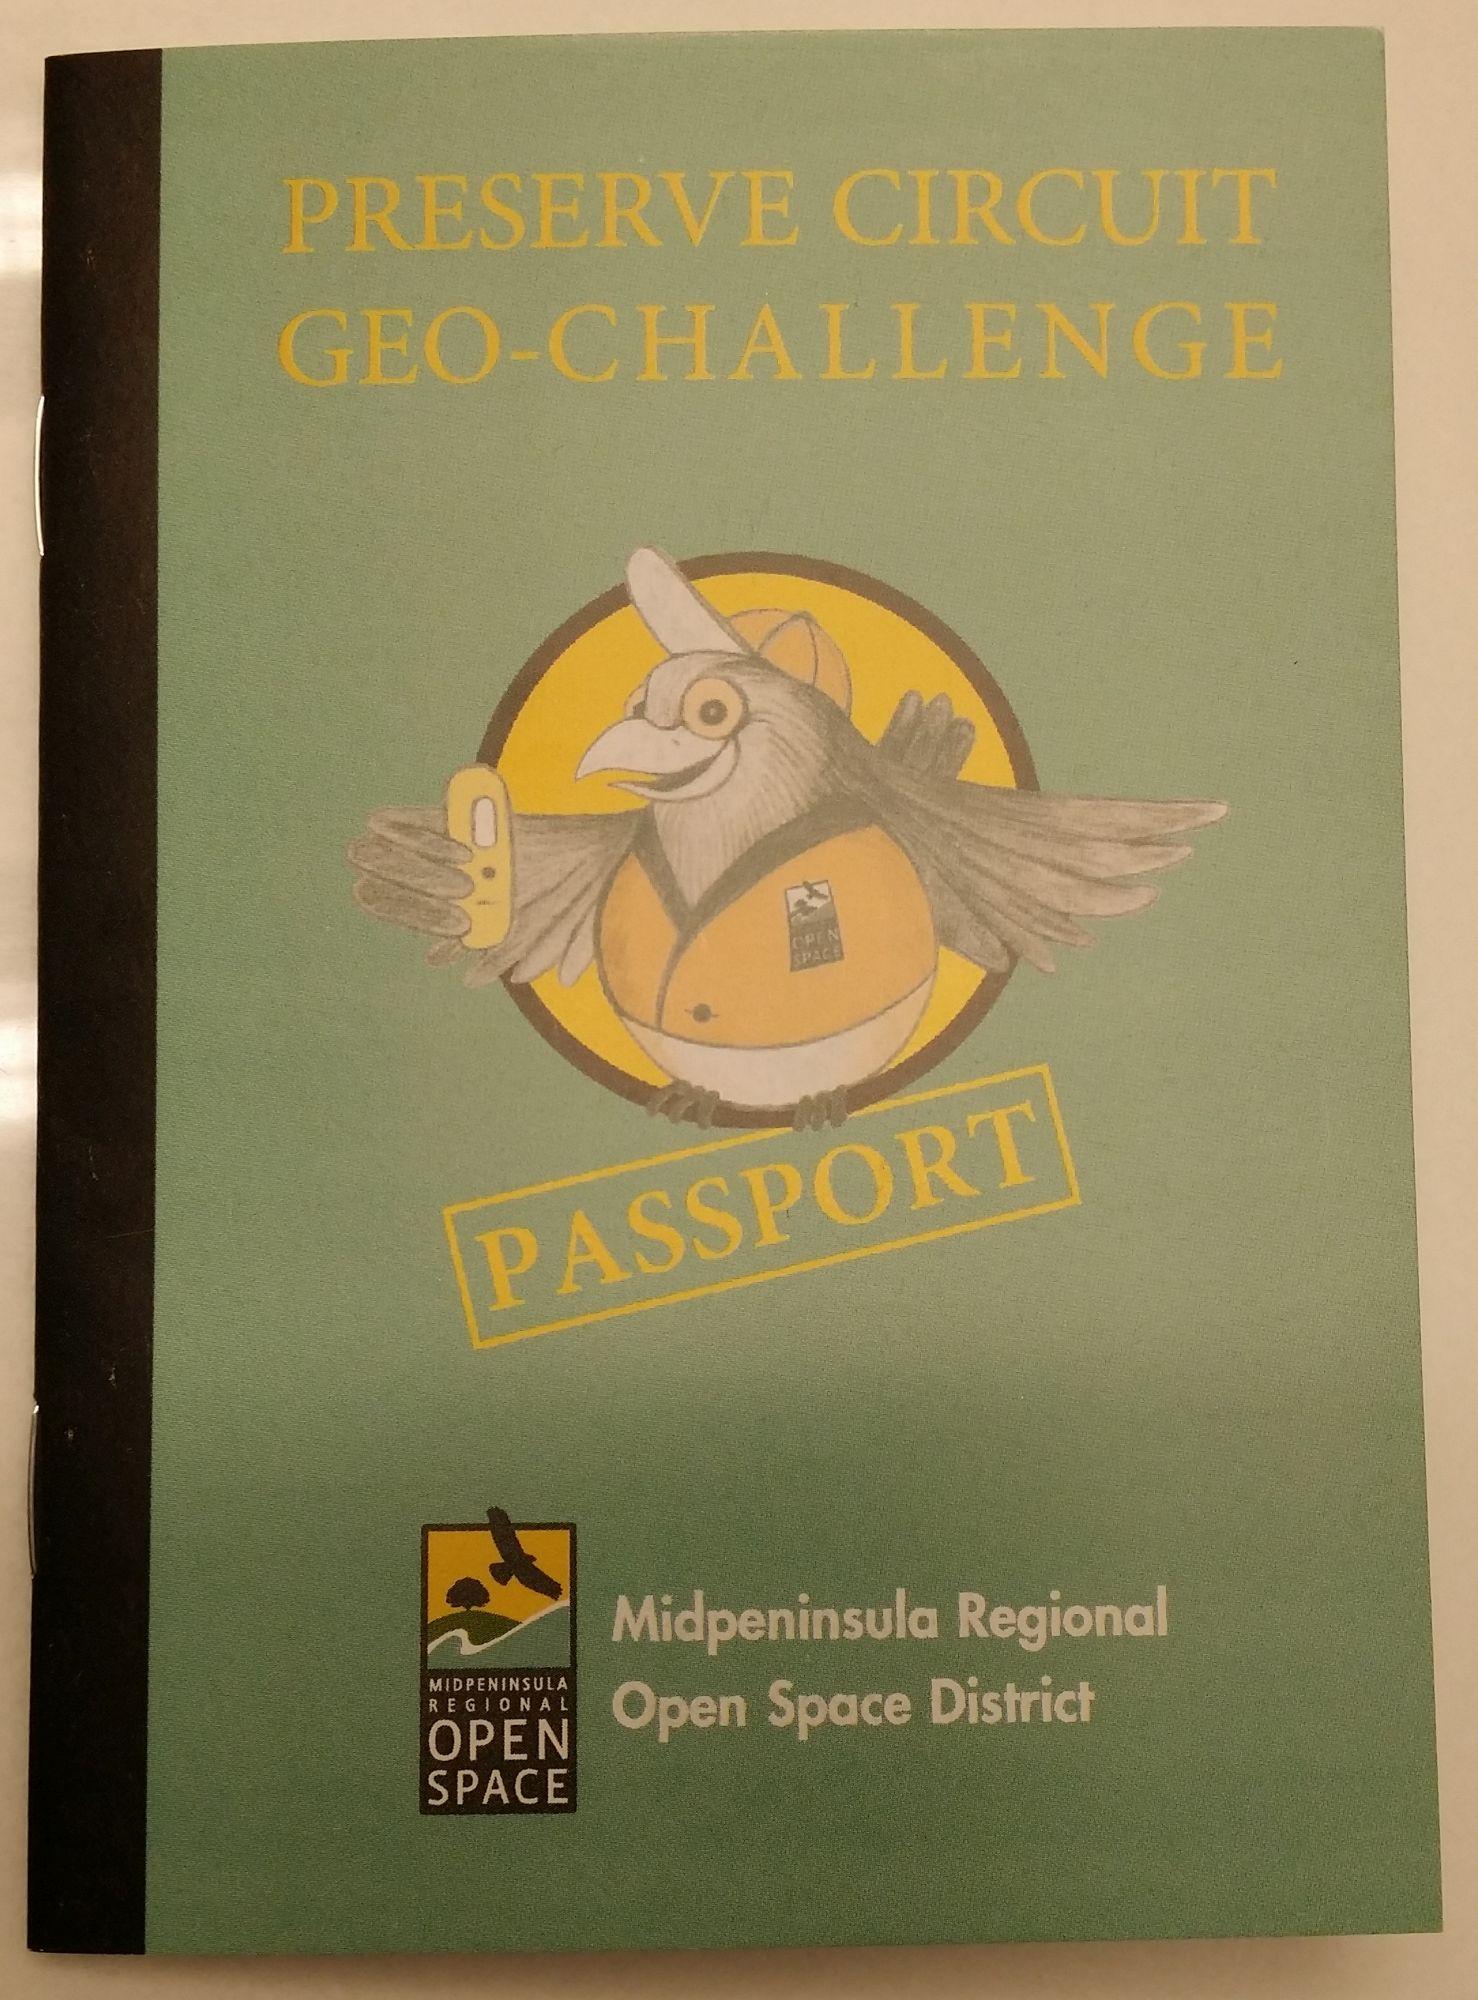 Preserve Circuit Geocache Challenge Passport arrived